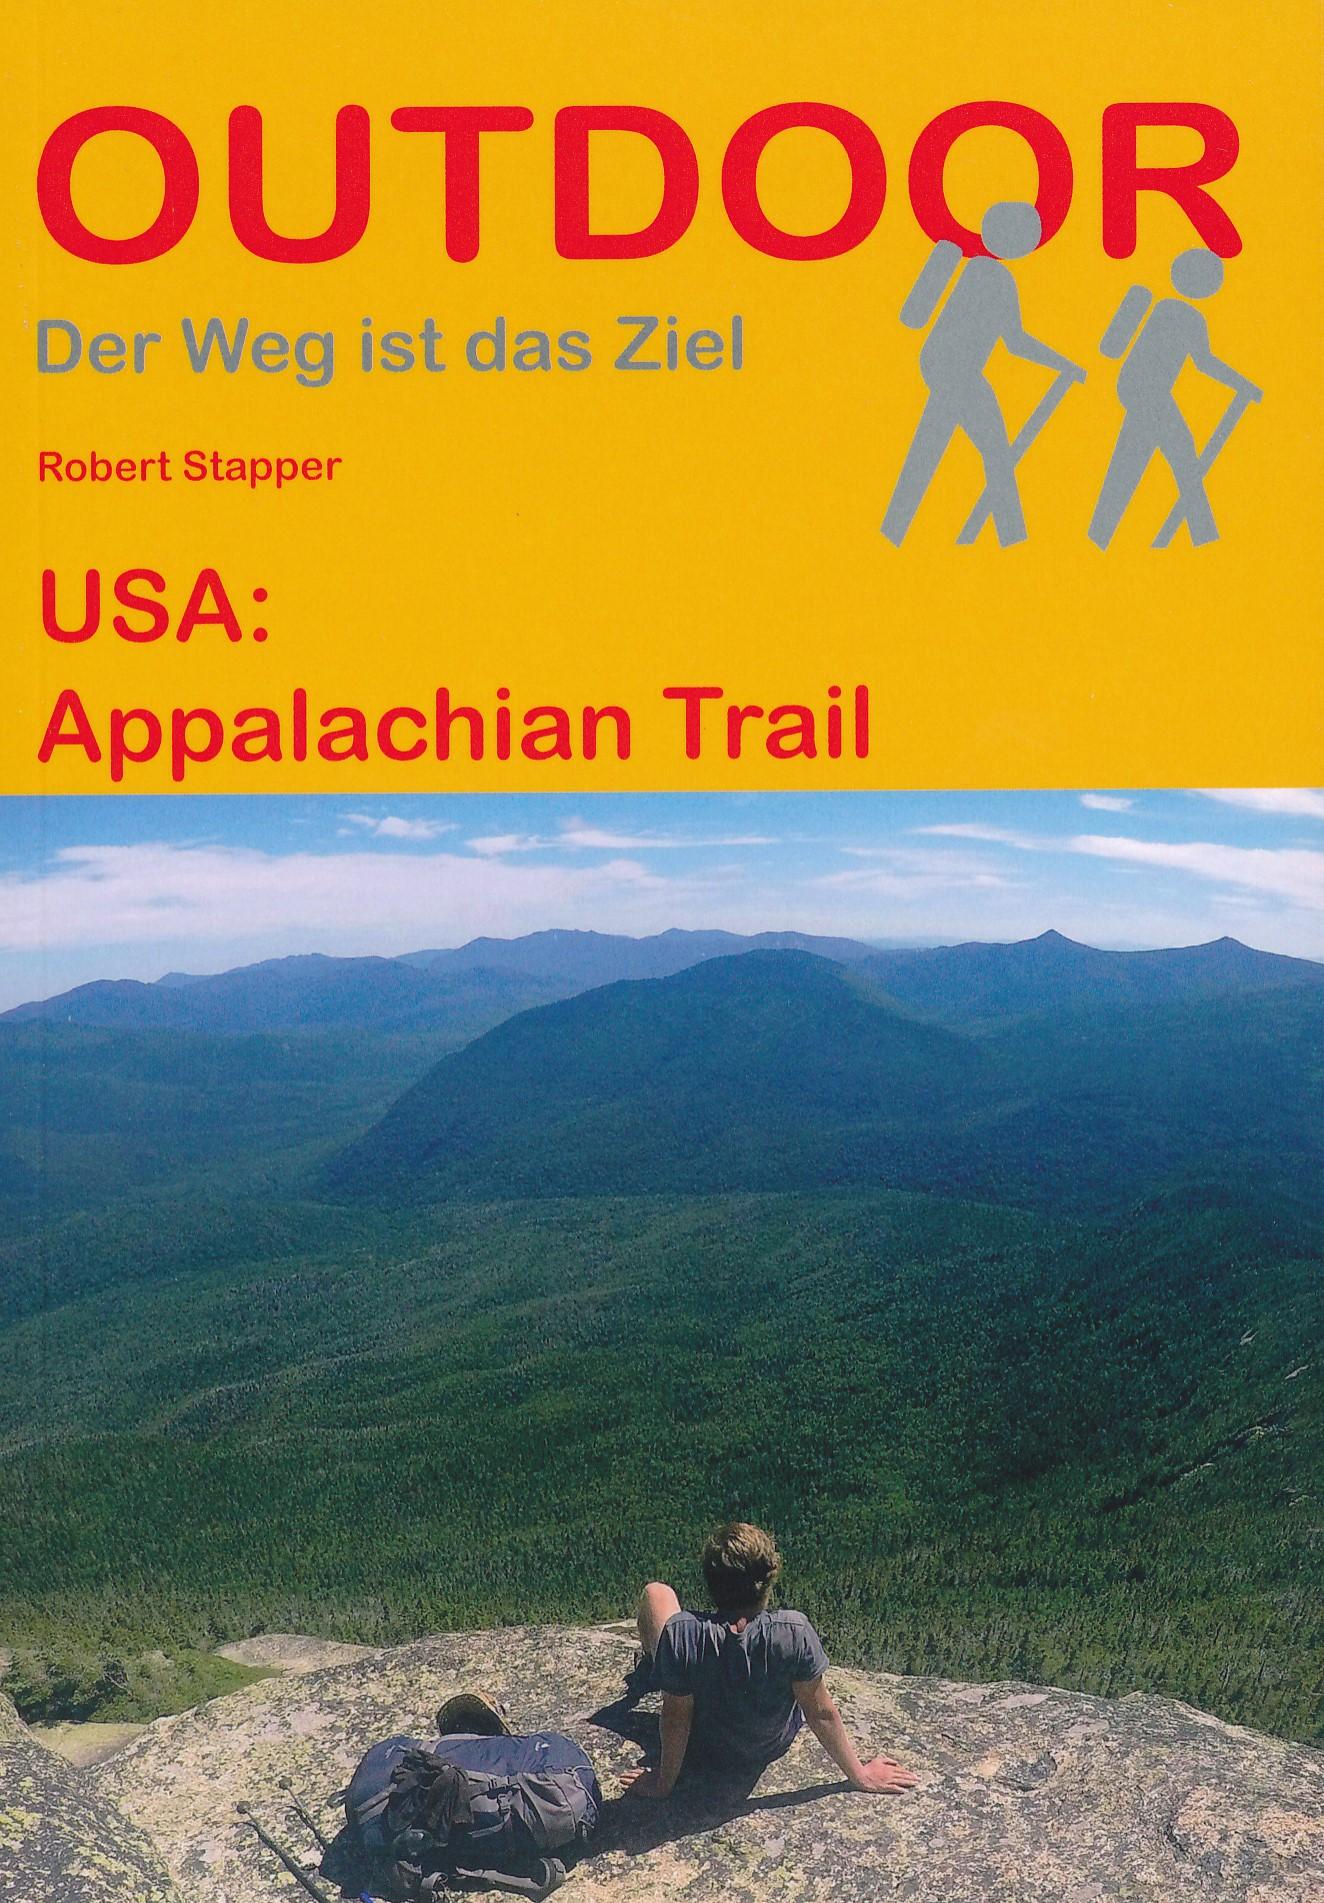 Wandelgids USA: Appalachian Trail | Conrad Stein Verlag